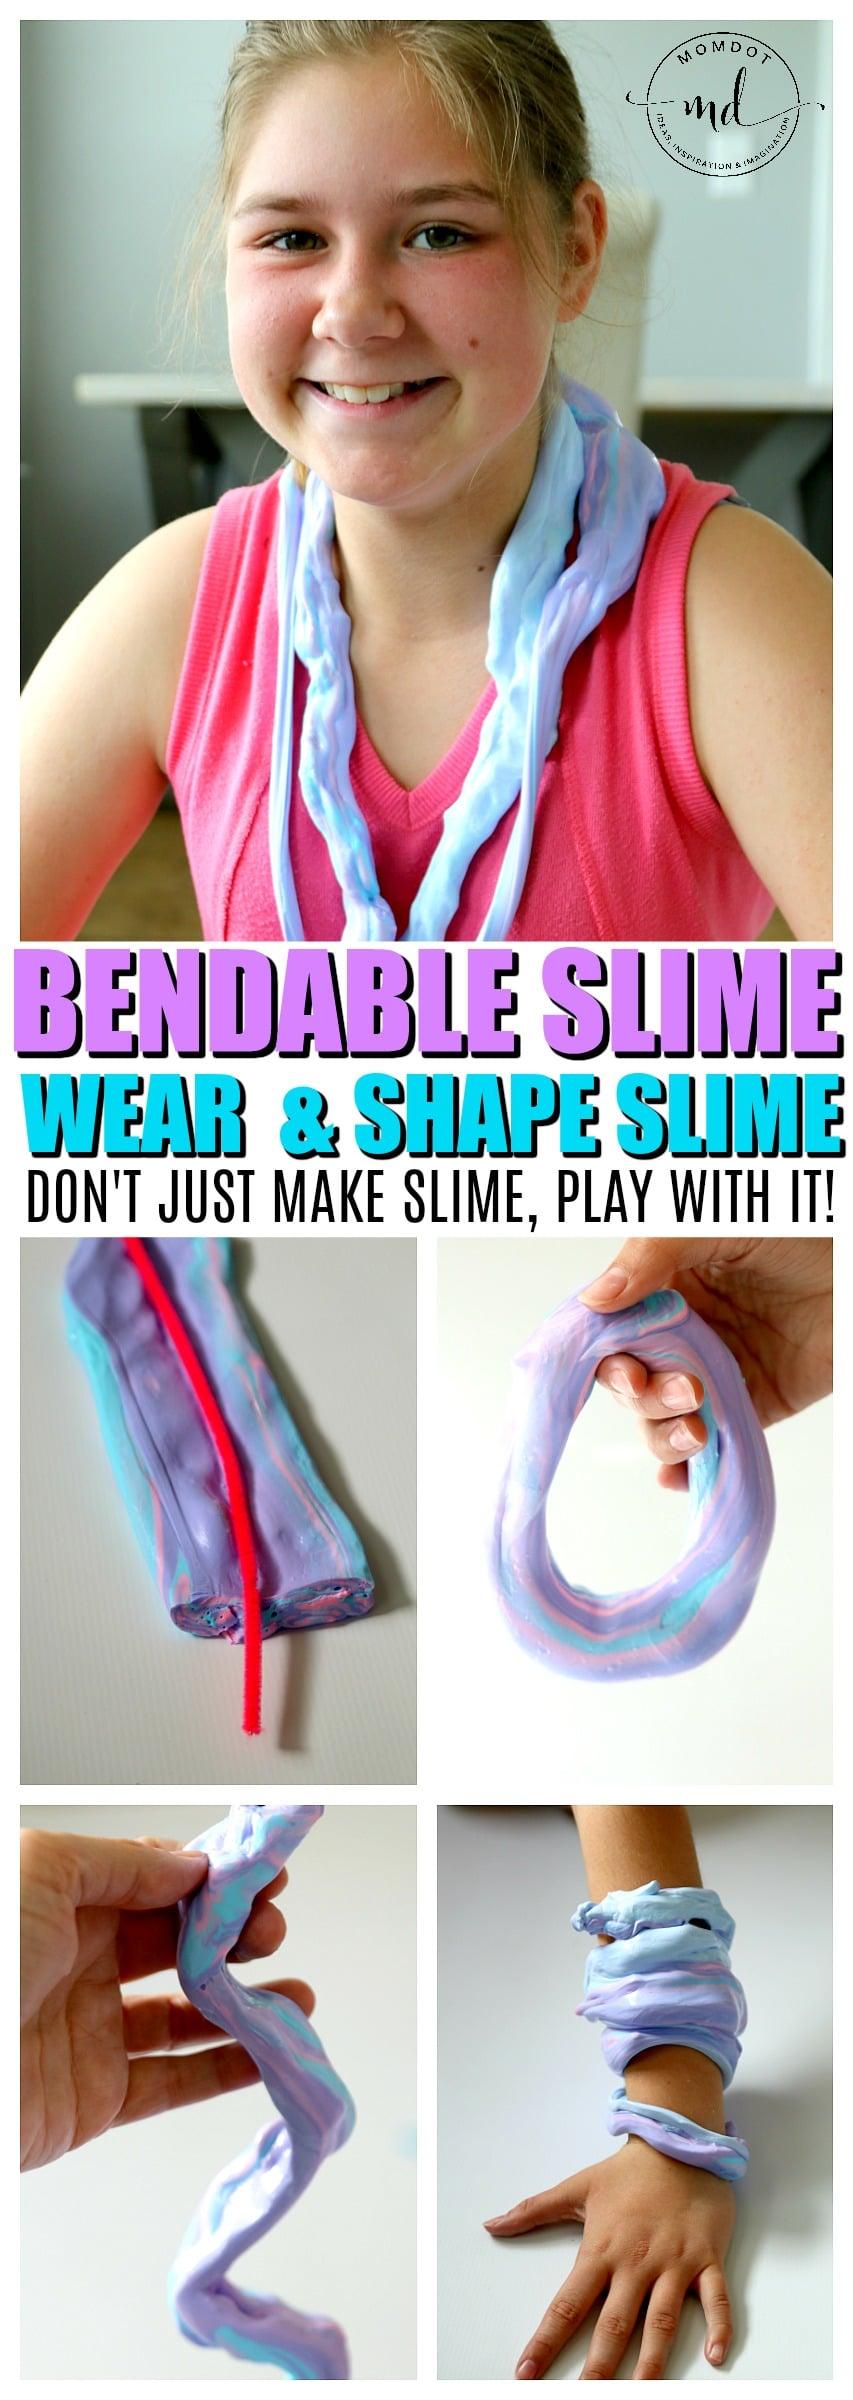 Bendable slime